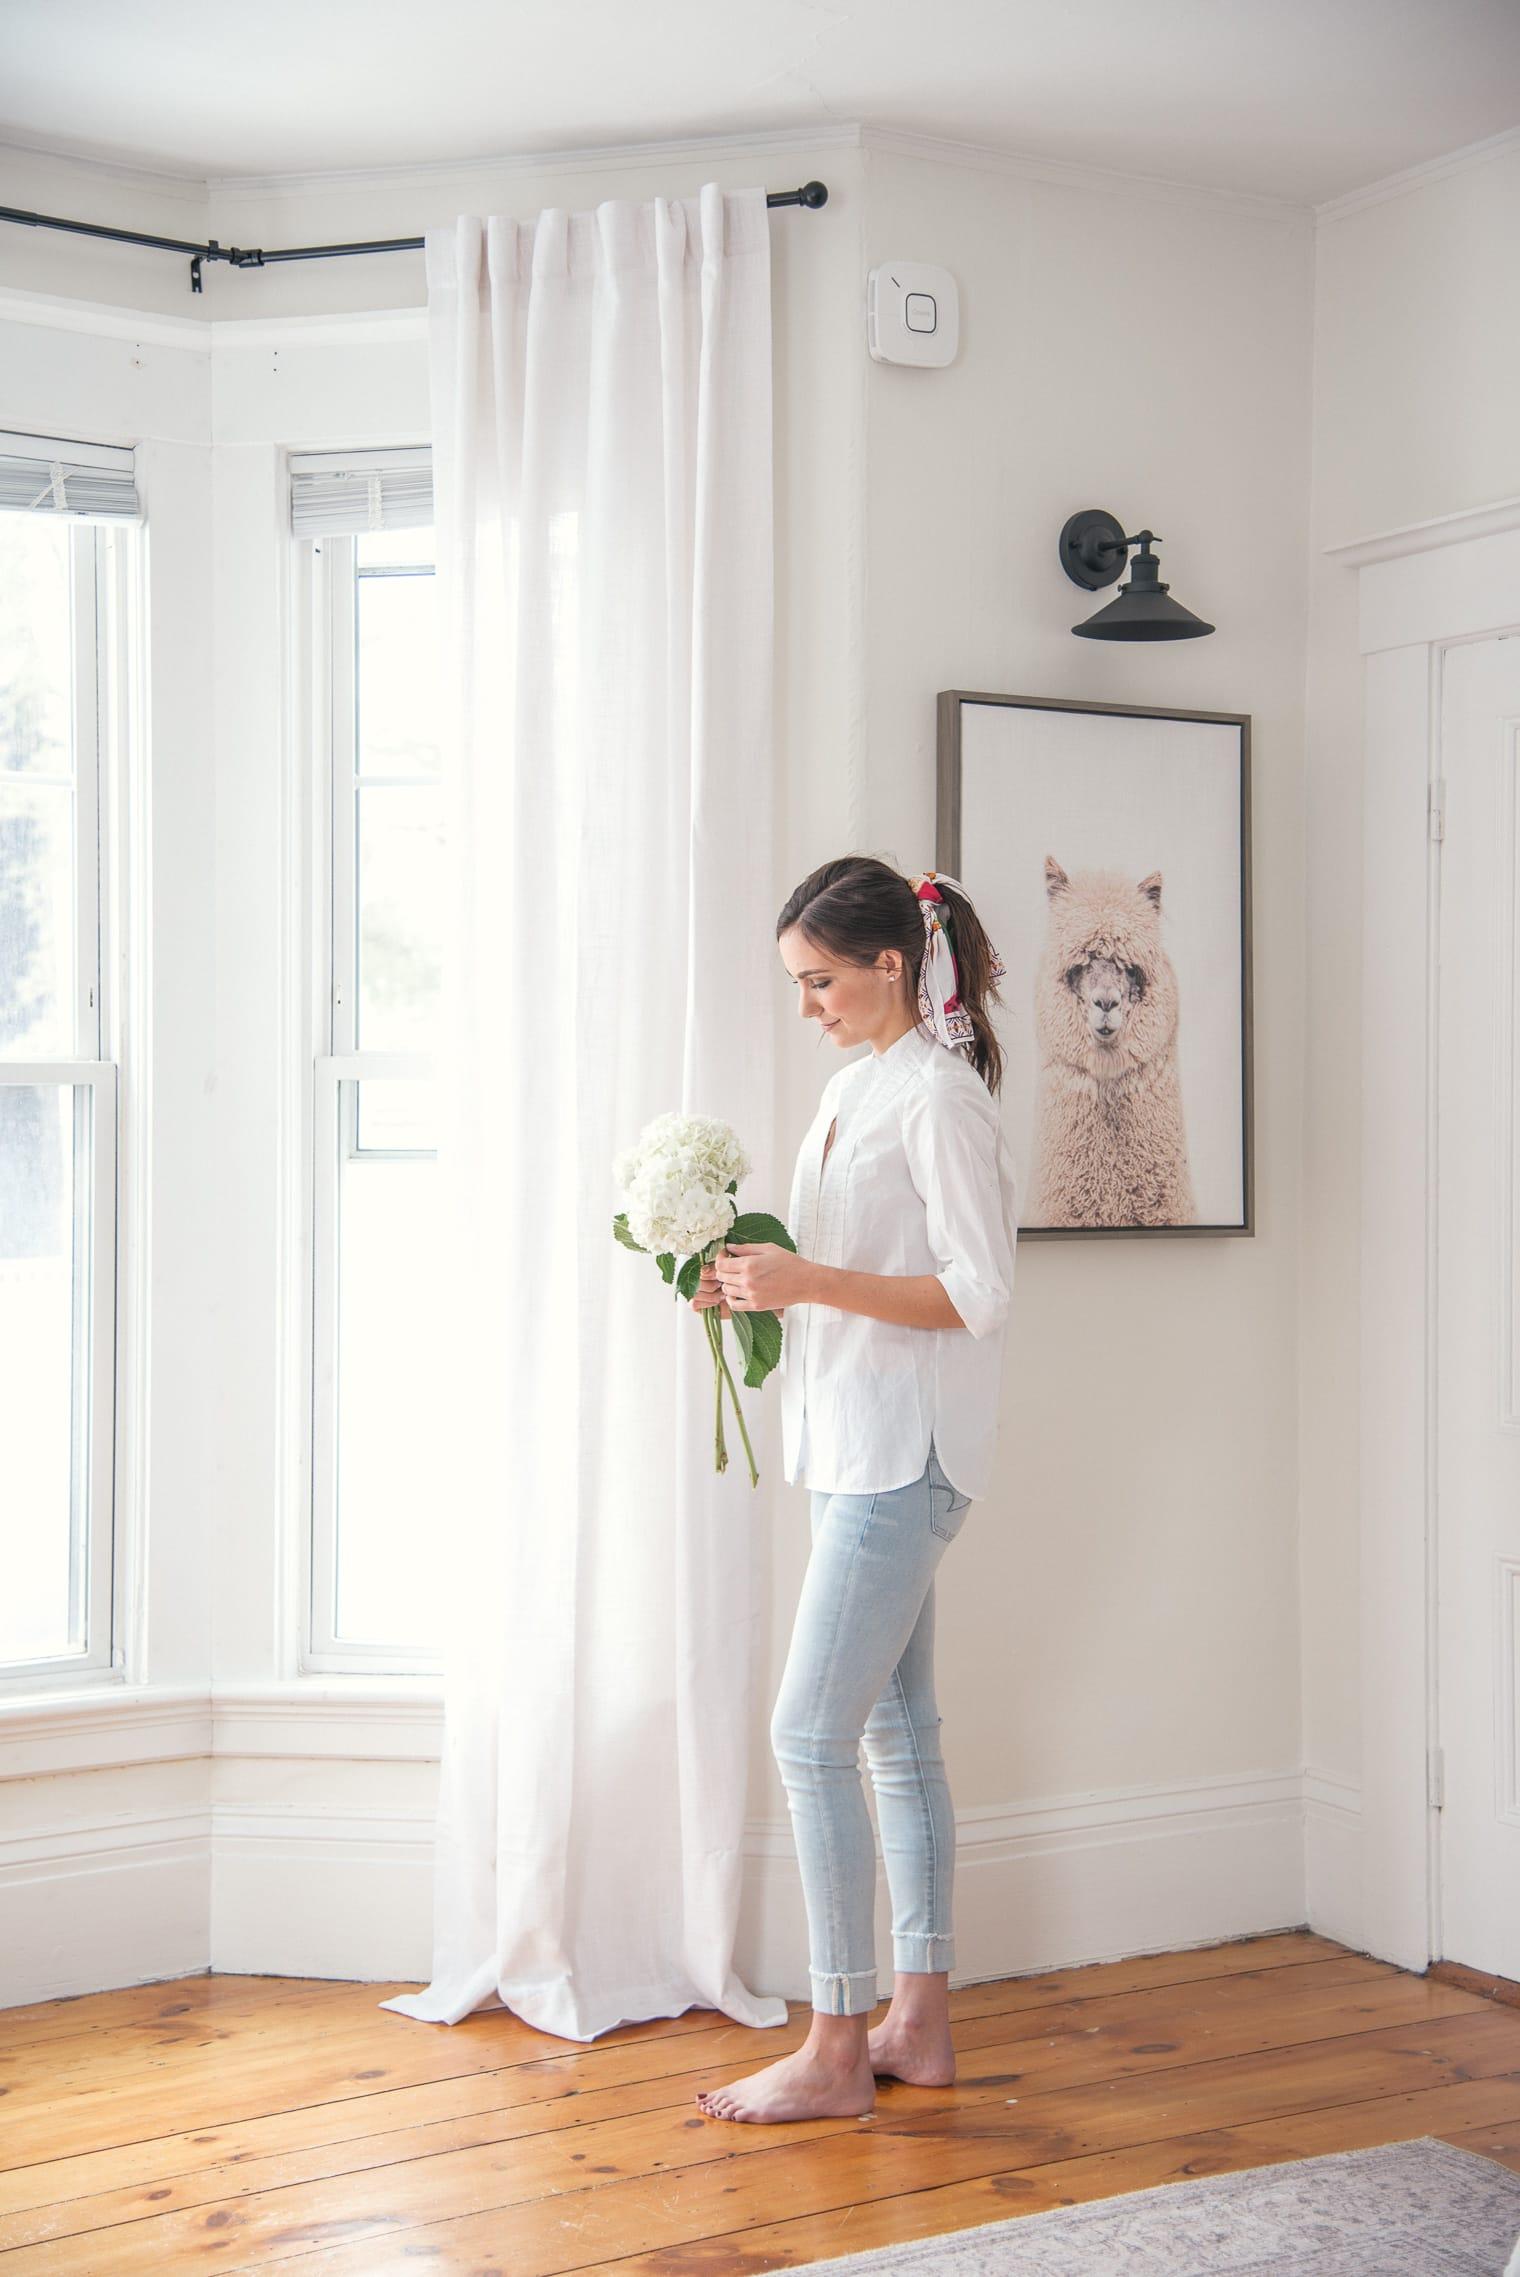 A New Apartment Checklist Free Printable